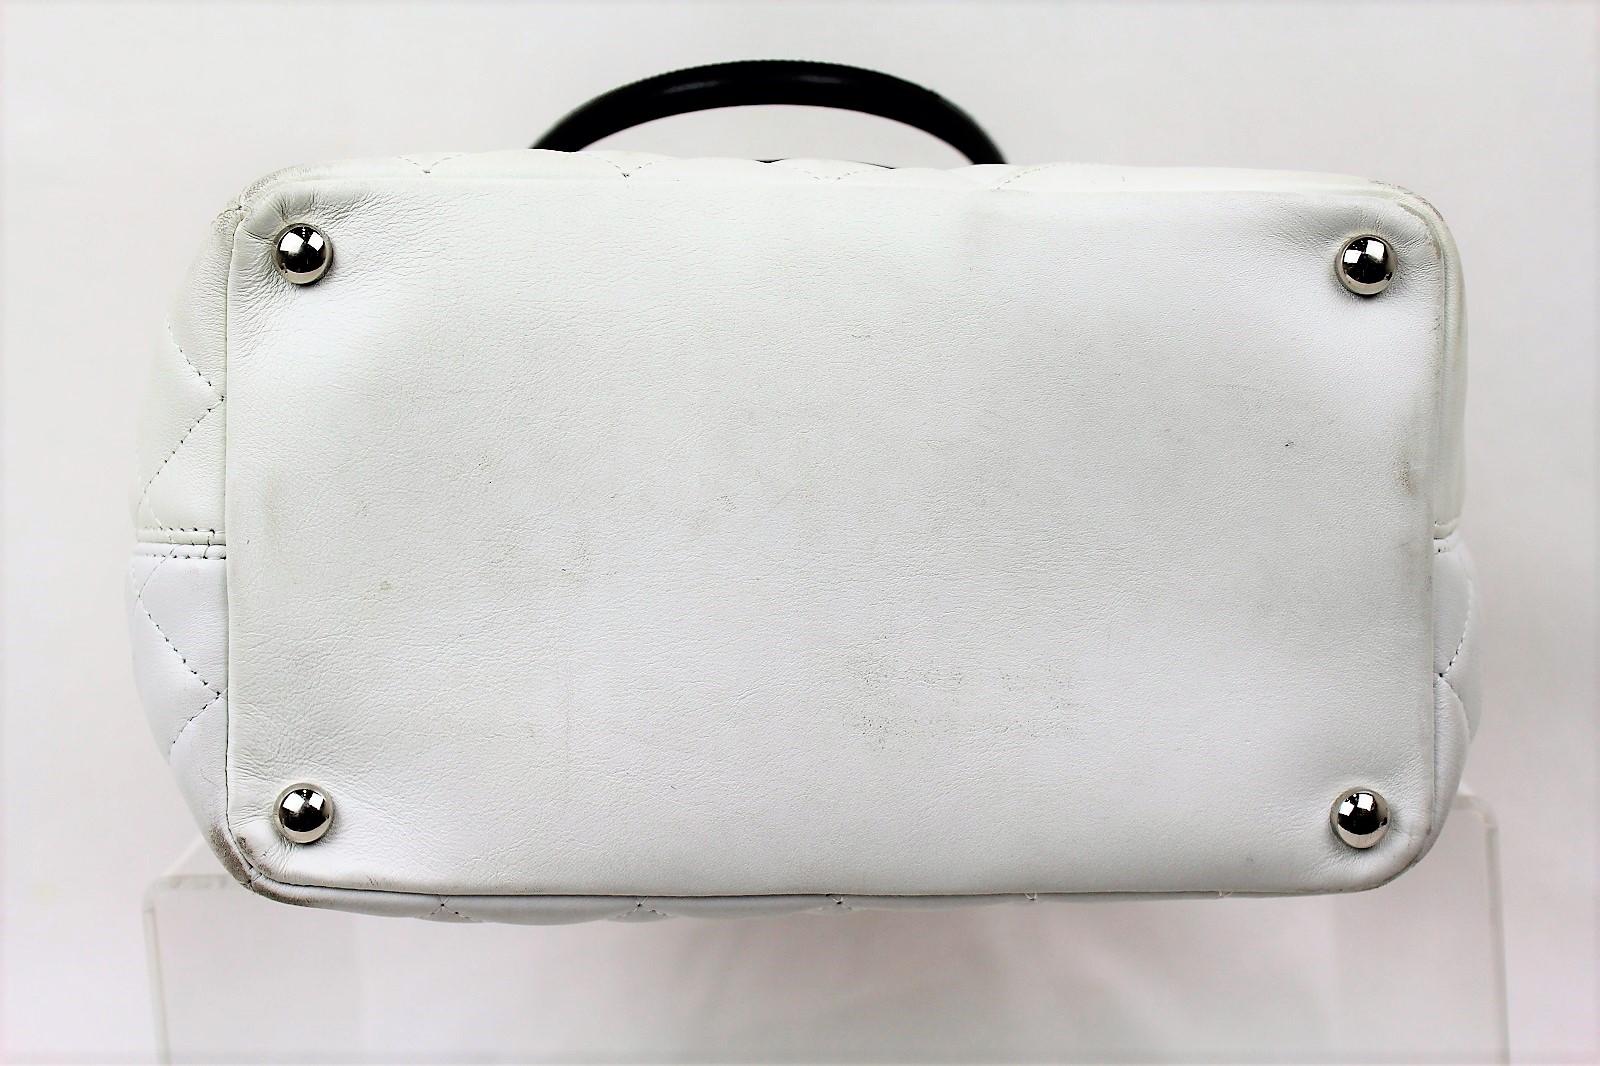 af34e7367459 【ギャラあり】CHANELシャネルヴィンテージA25167パイソンカンボントートハンドバッグ ...